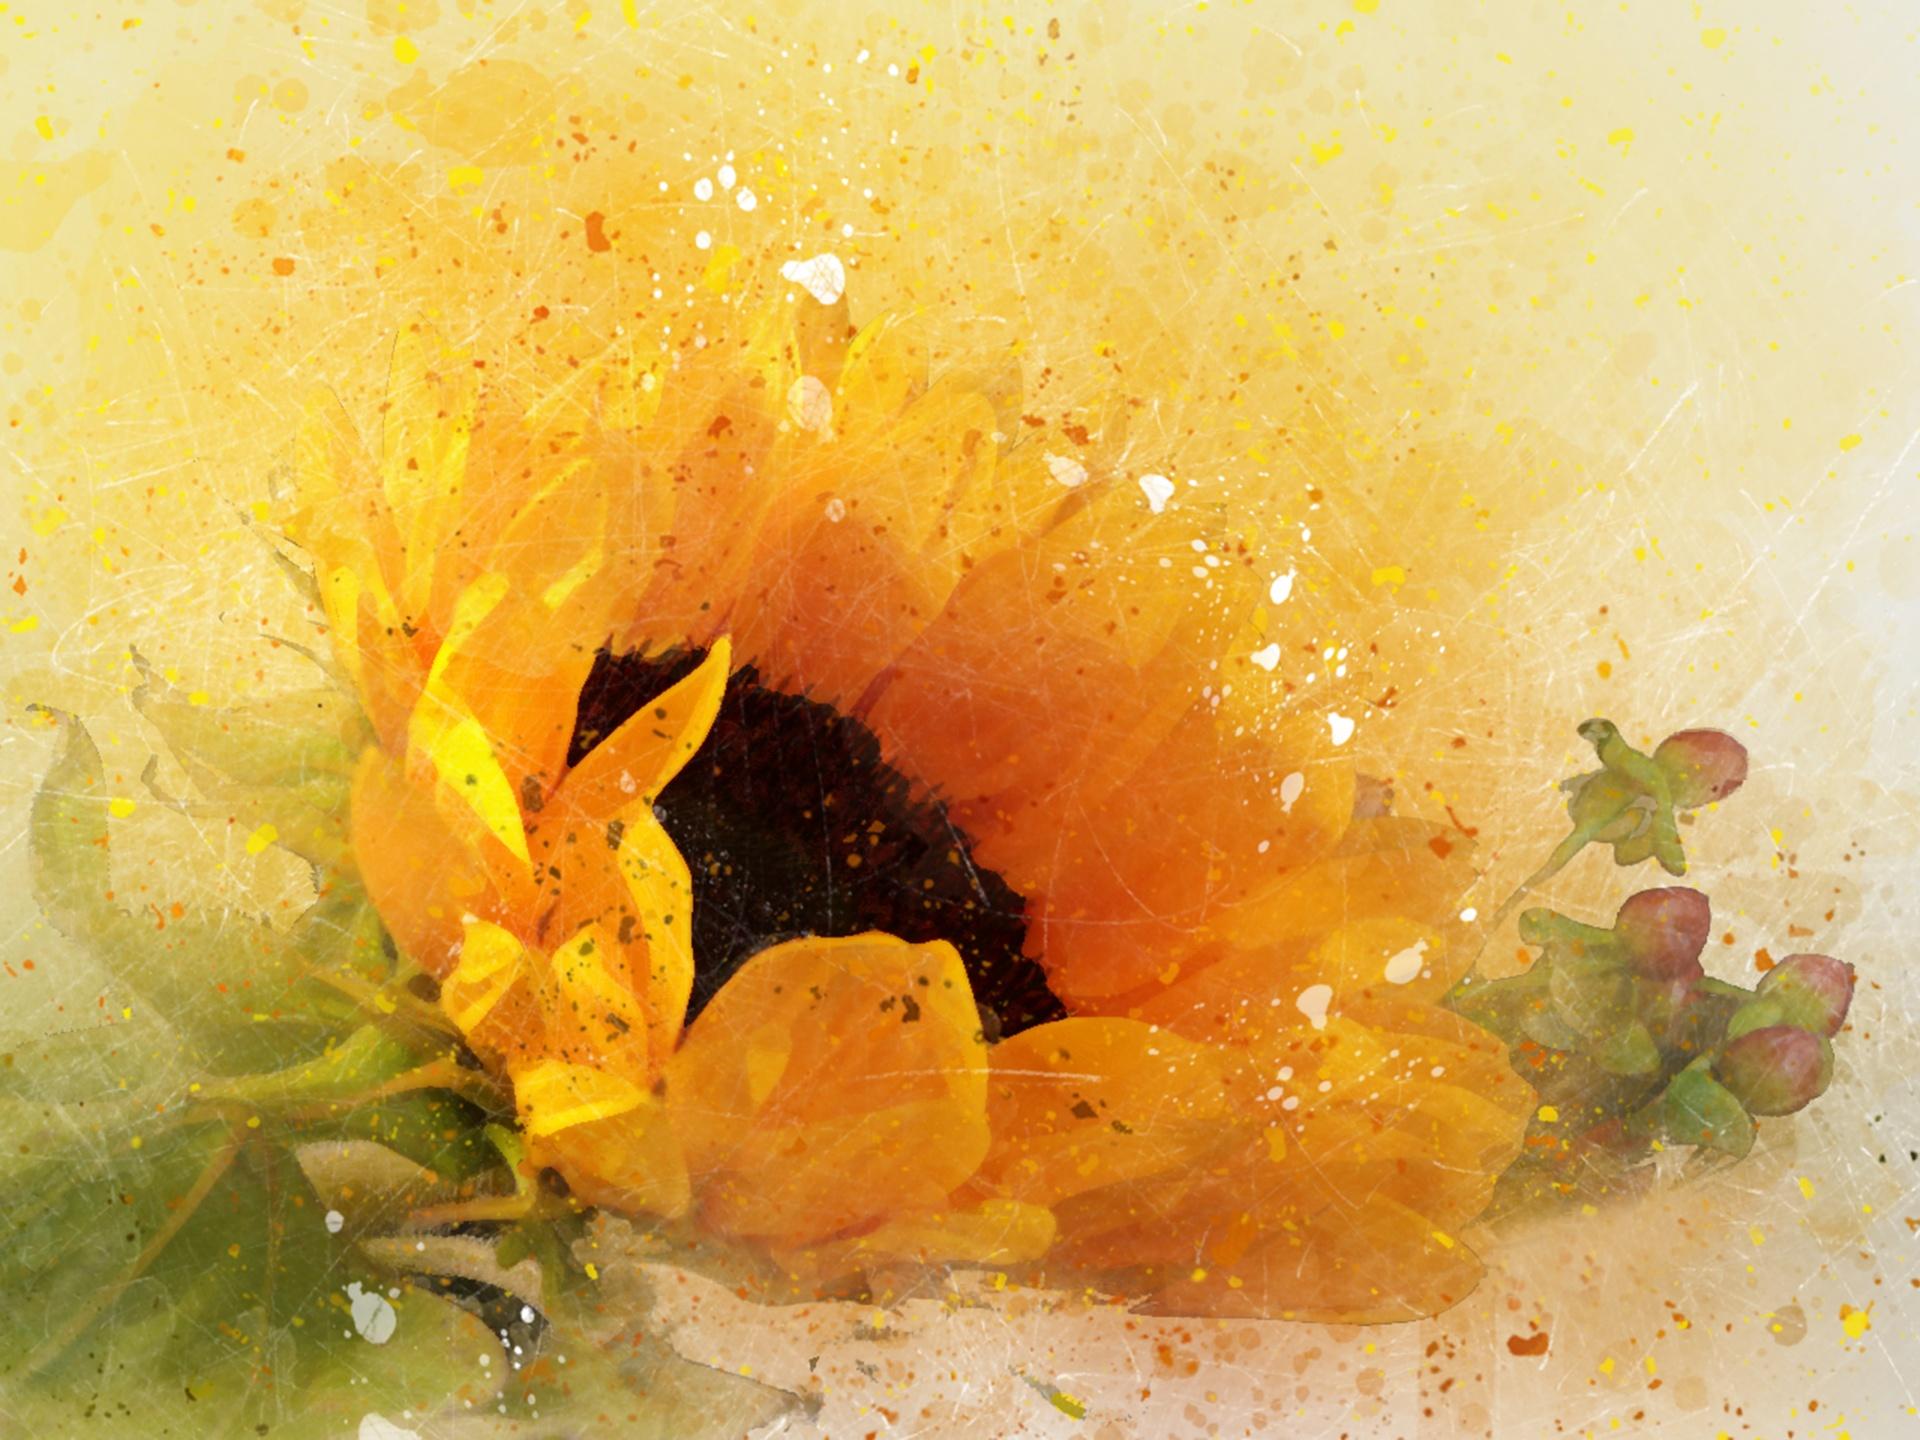 Sunflower Watercolor and Splatter